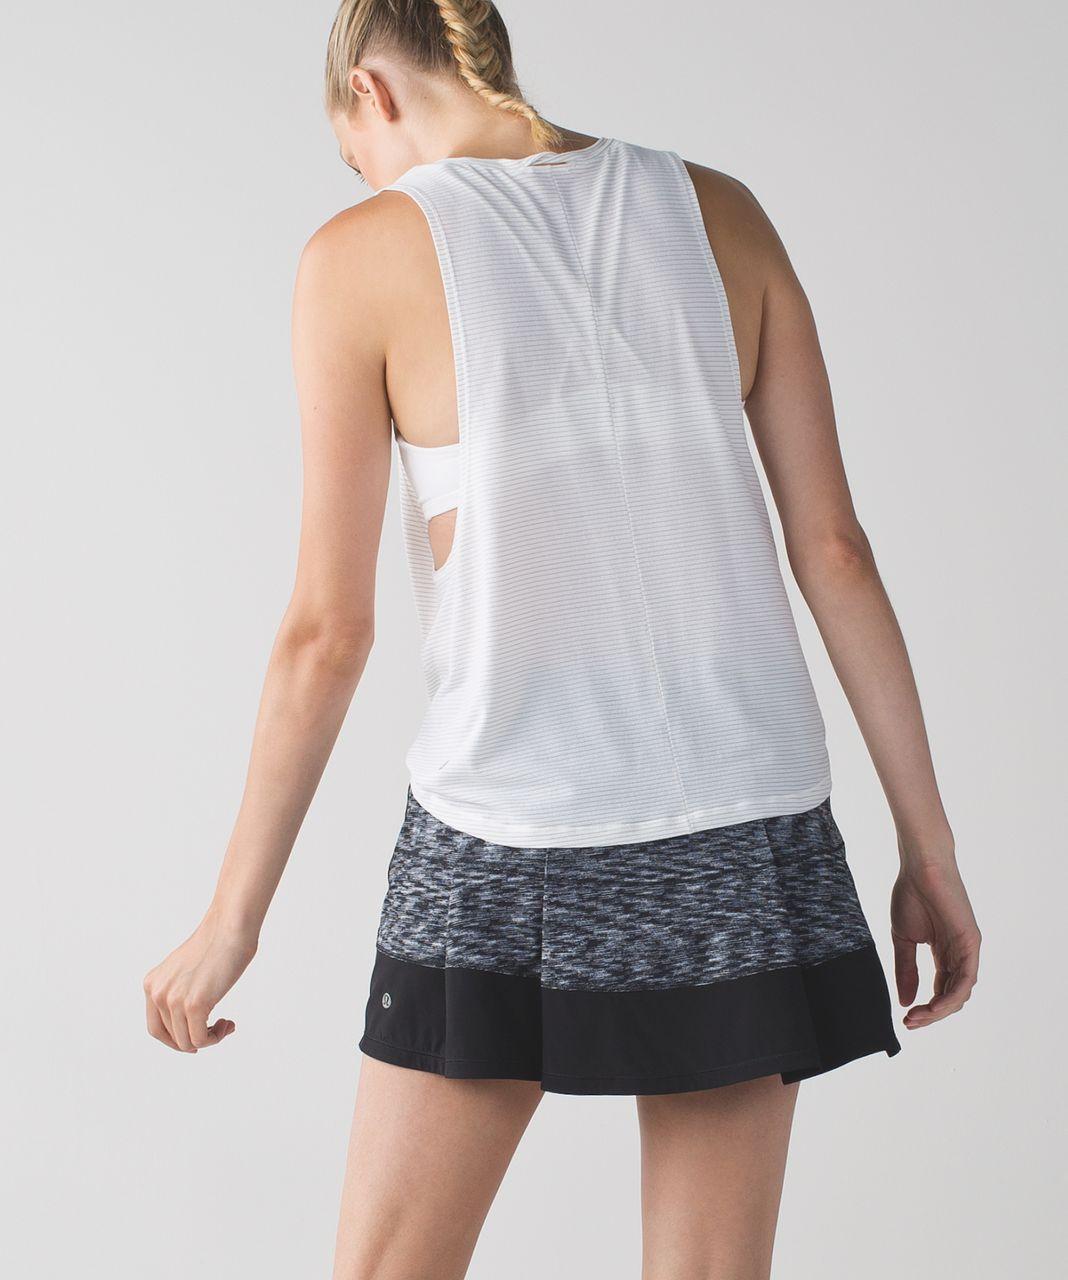 Lululemon Pace Rival Skirt II (Tall) *4-way Stretch - Dramatic Static White Black / Black